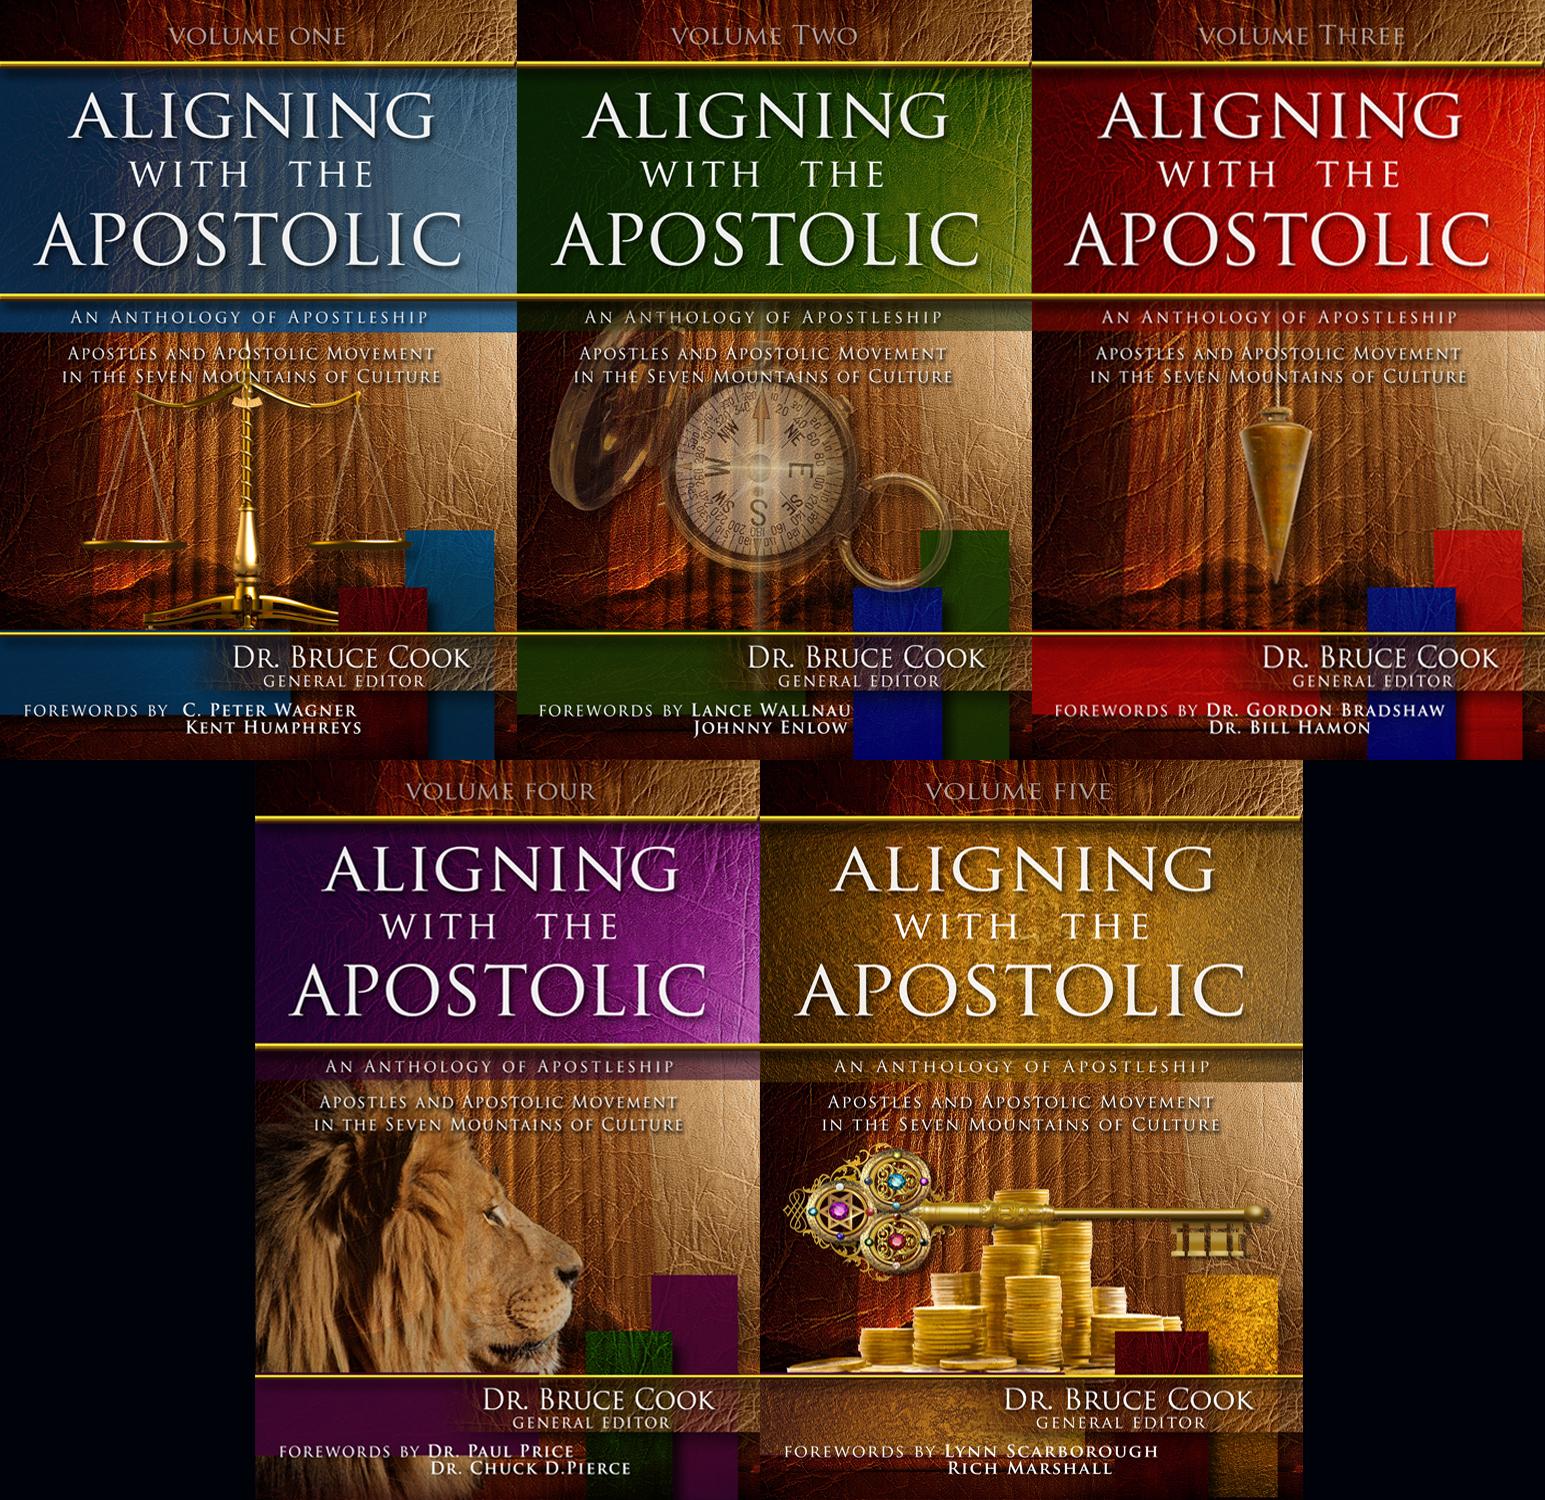 Aligning+with+the+Apostolic+5-Volume+Set+web.jpg